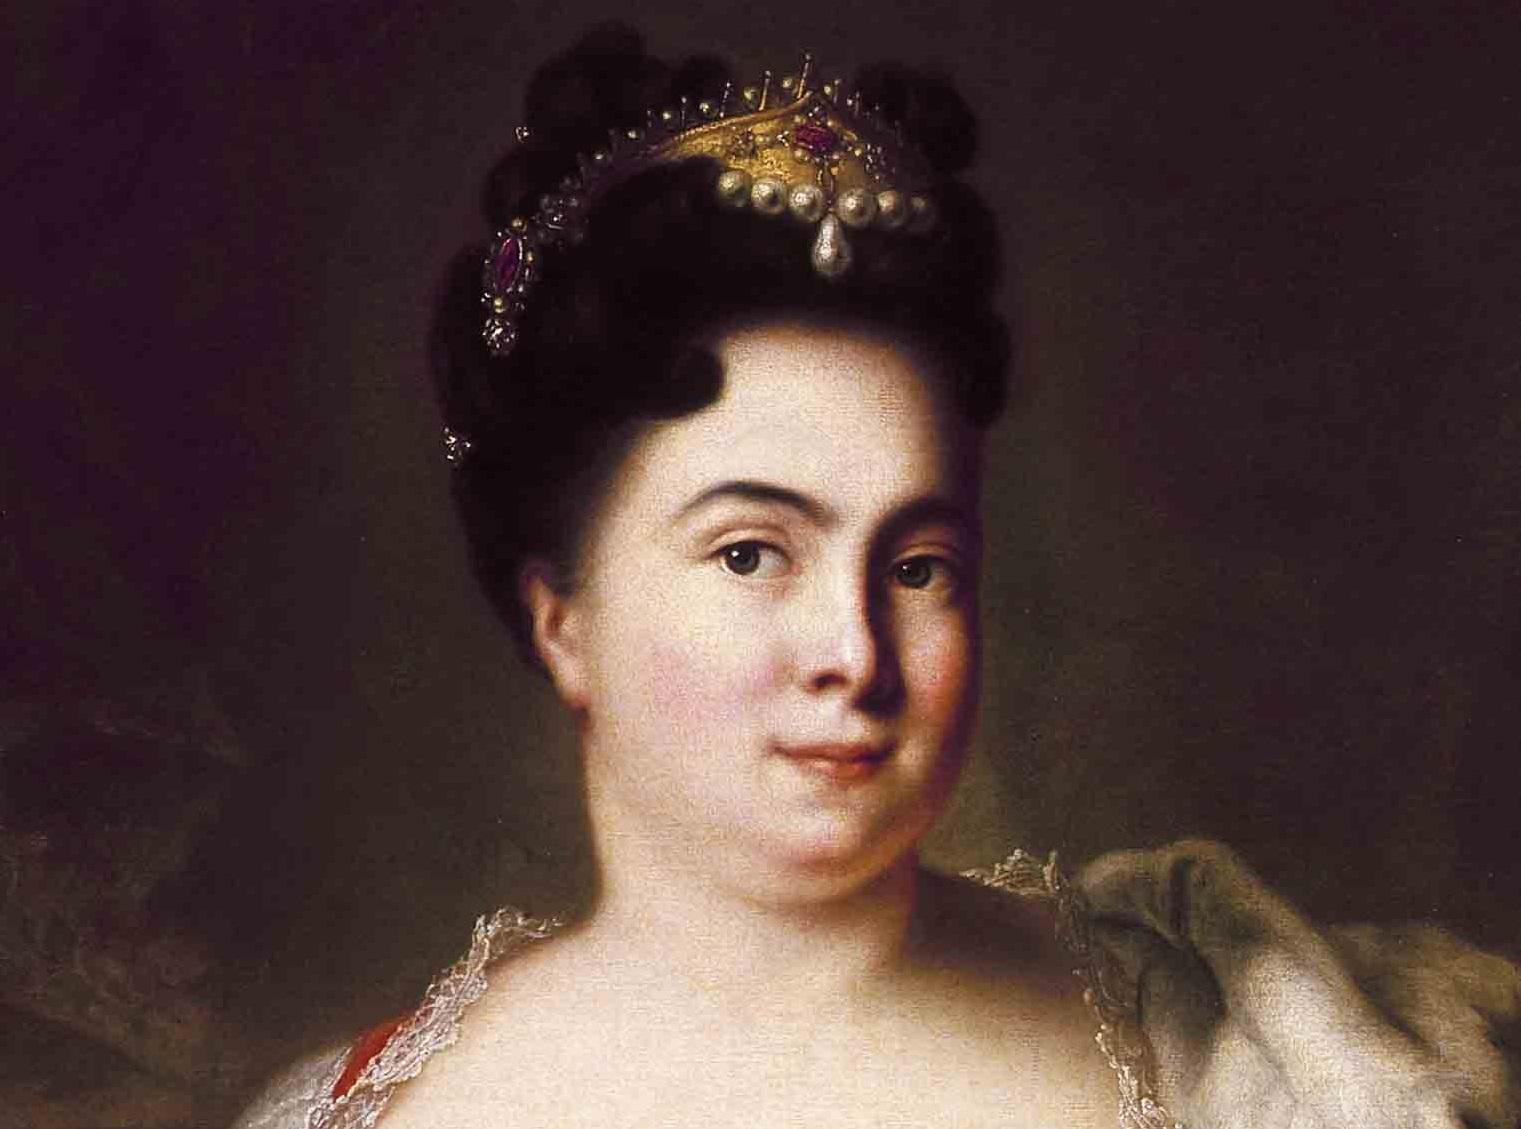 Рисунок 6. Екатерина I